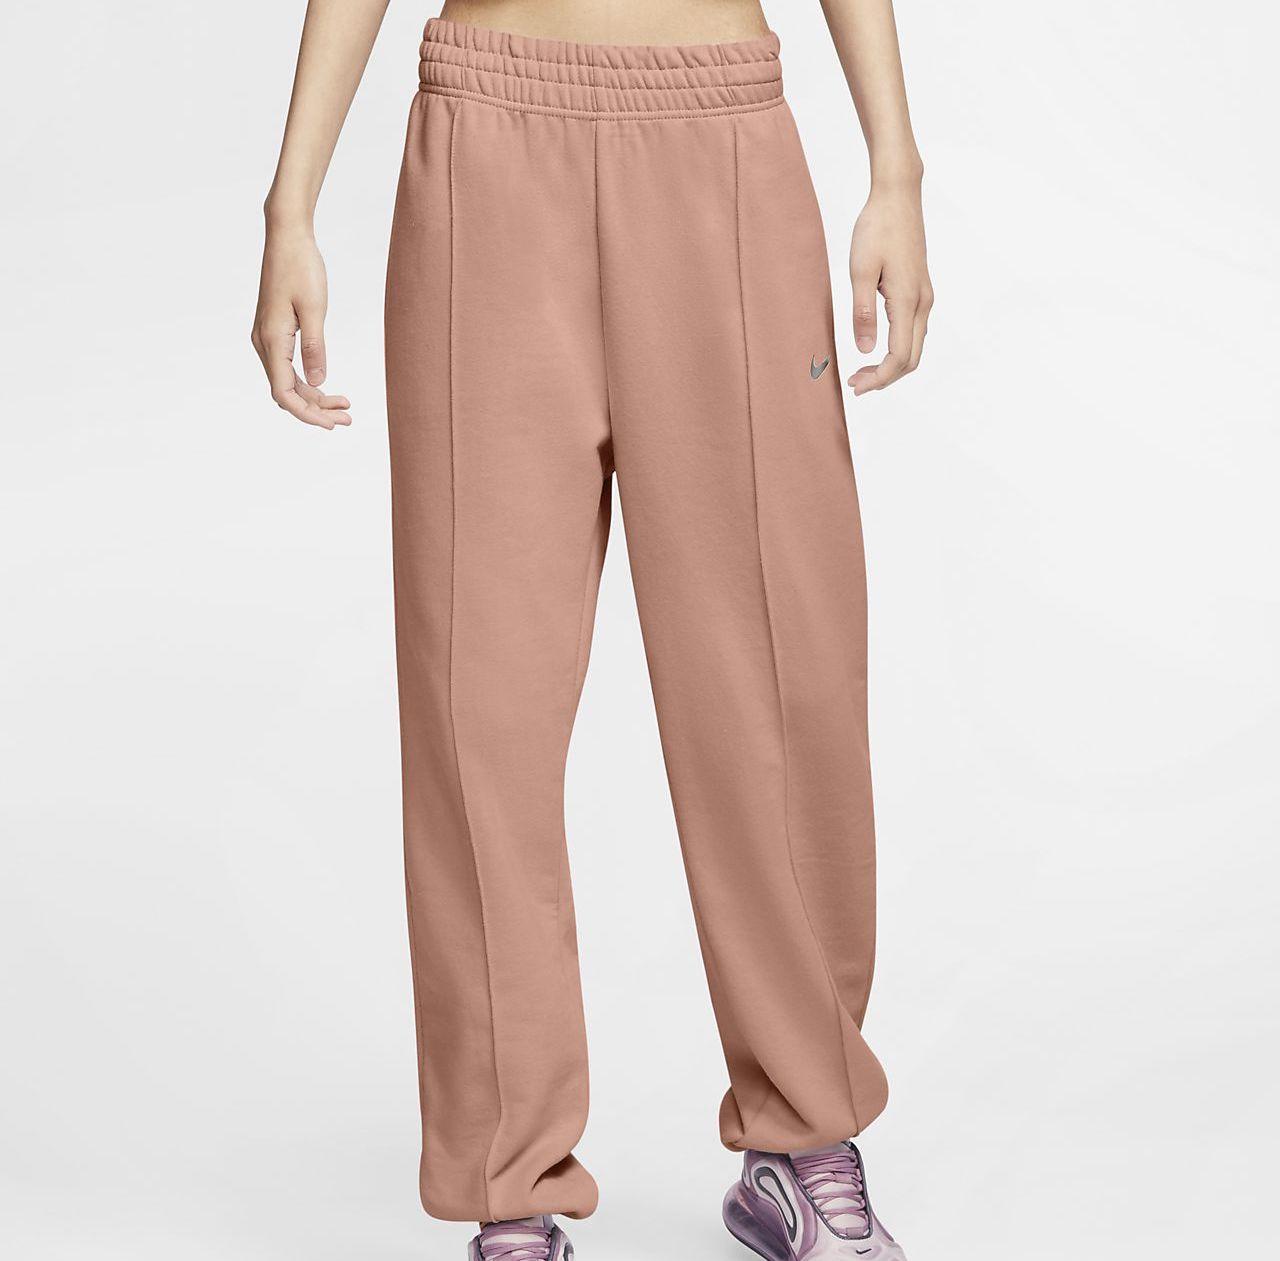 Nike Sportswear Trousers Pink Quartz